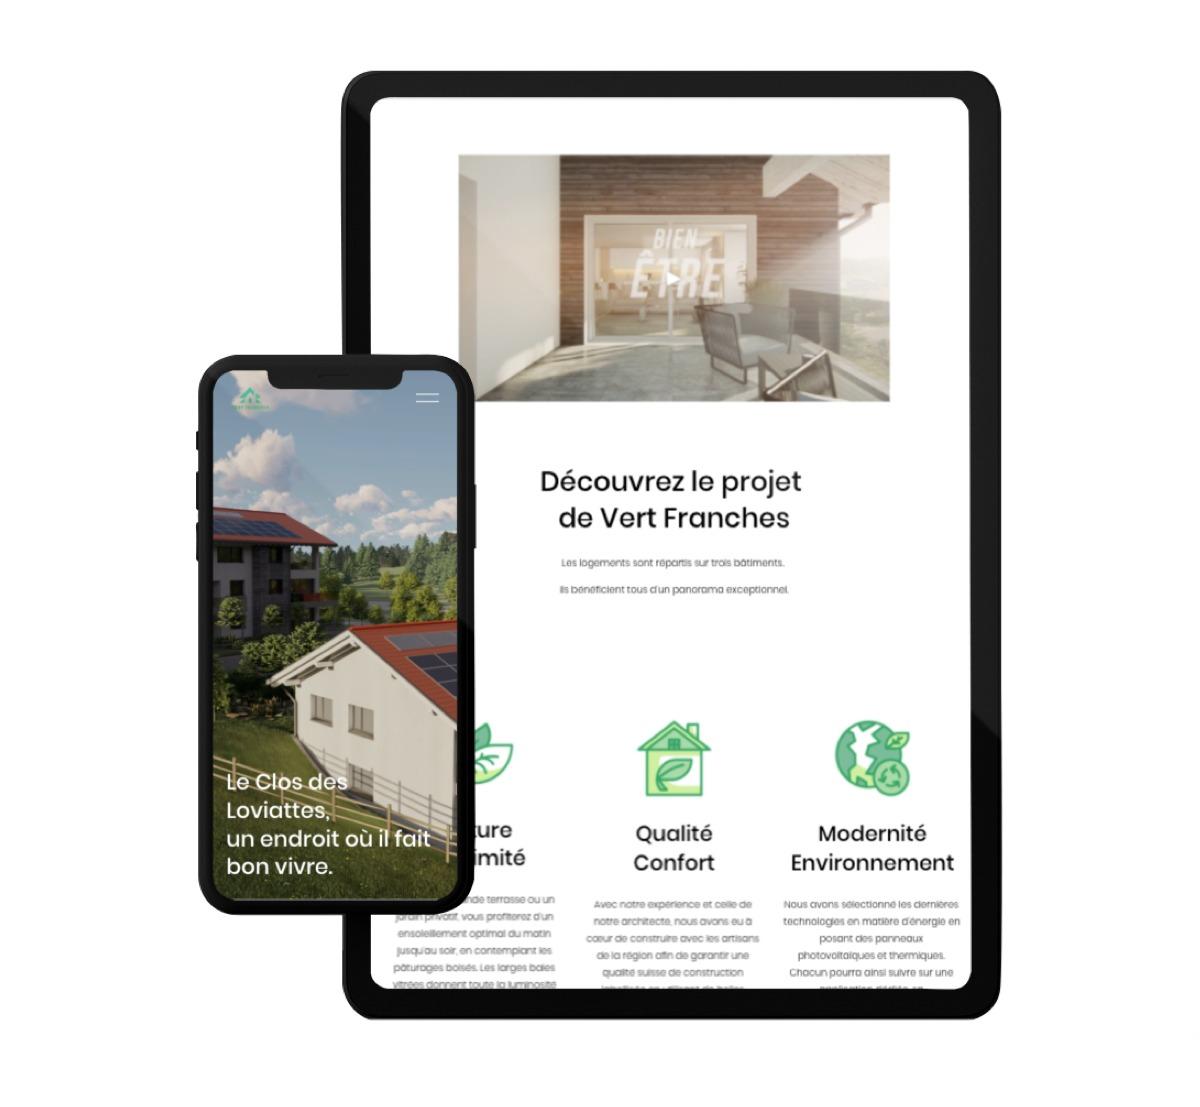 vertfranches-website-enigma